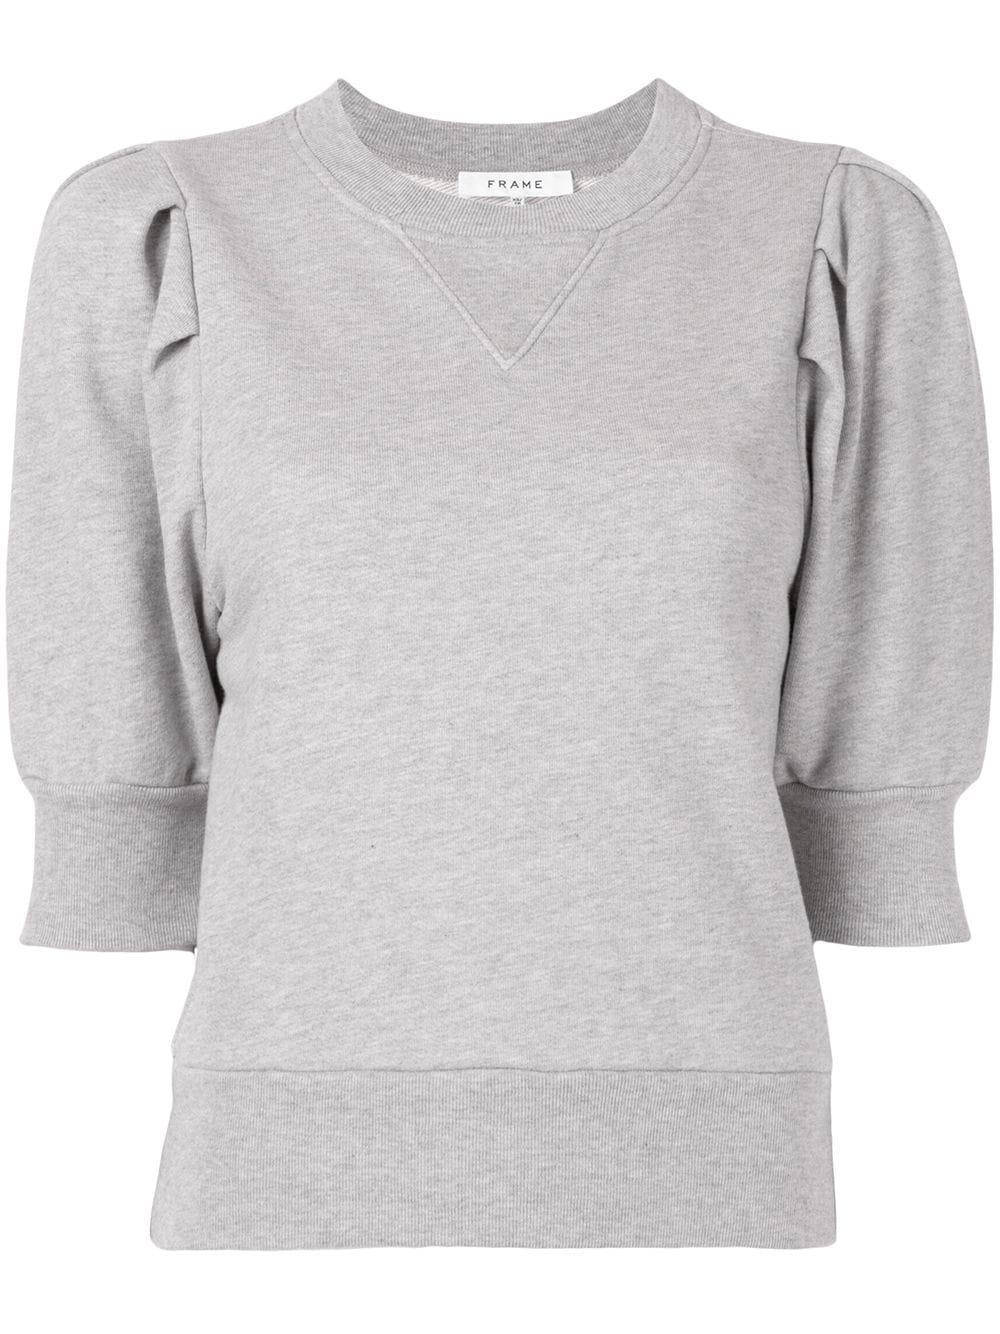 Puff Sleeve Sweatshirt Item # LWAC0342